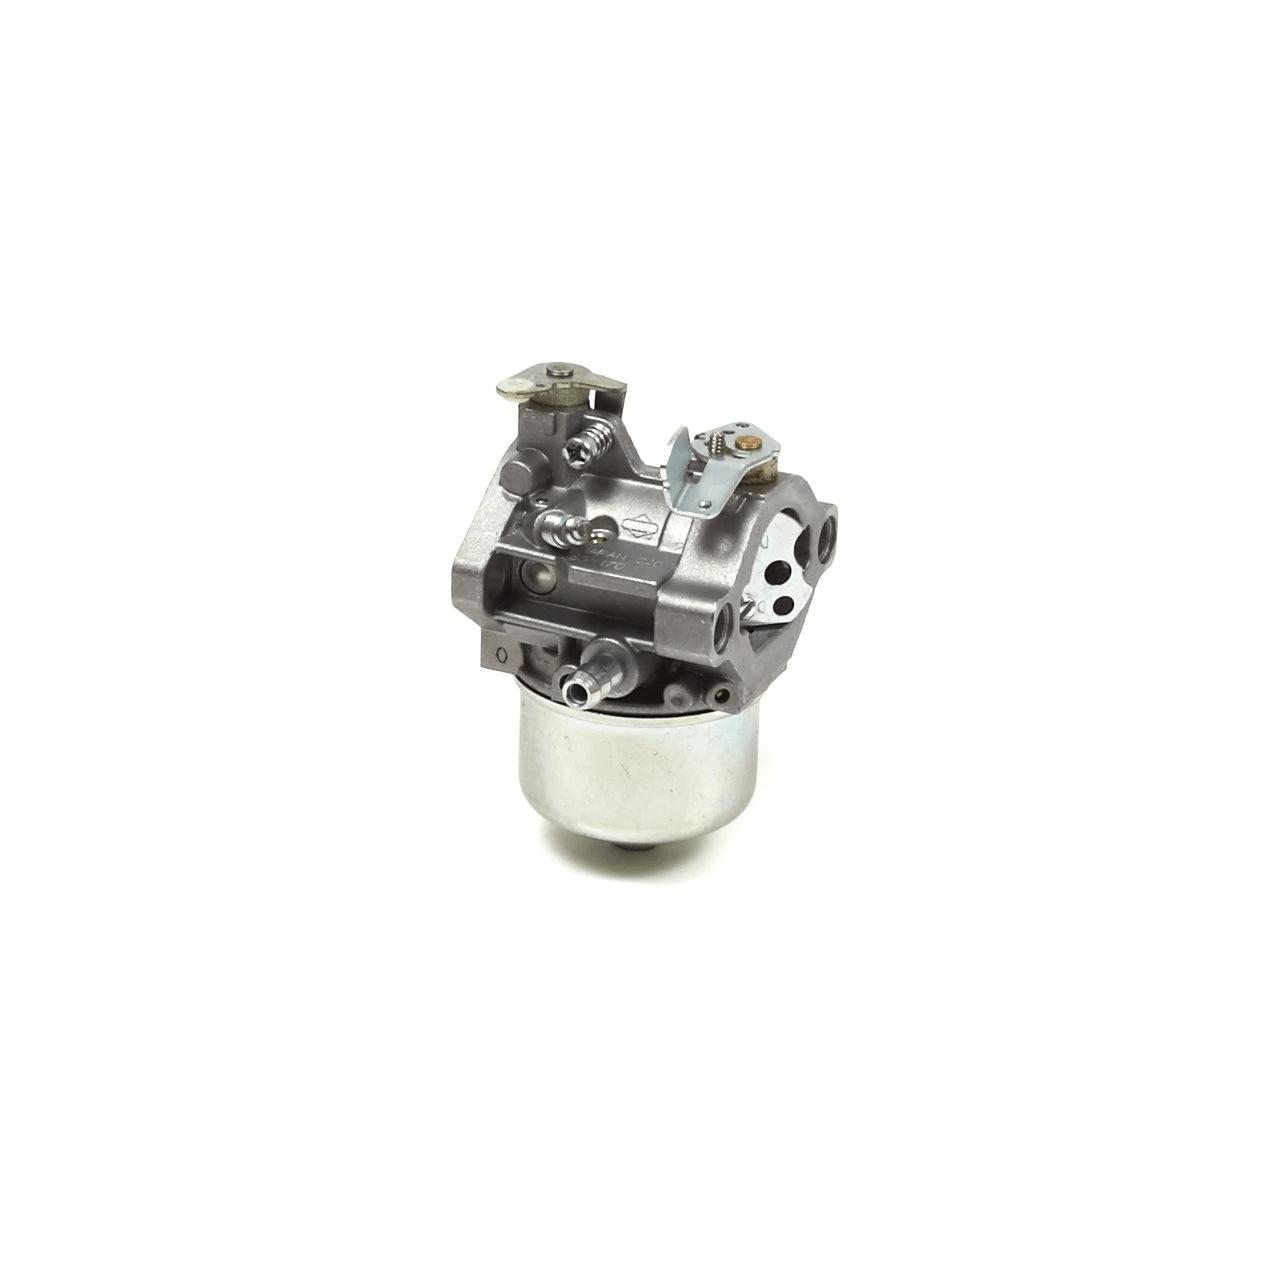 medium resolution of briggs stratton 698171 carburetor where used part number 698171 model name diagram 283702